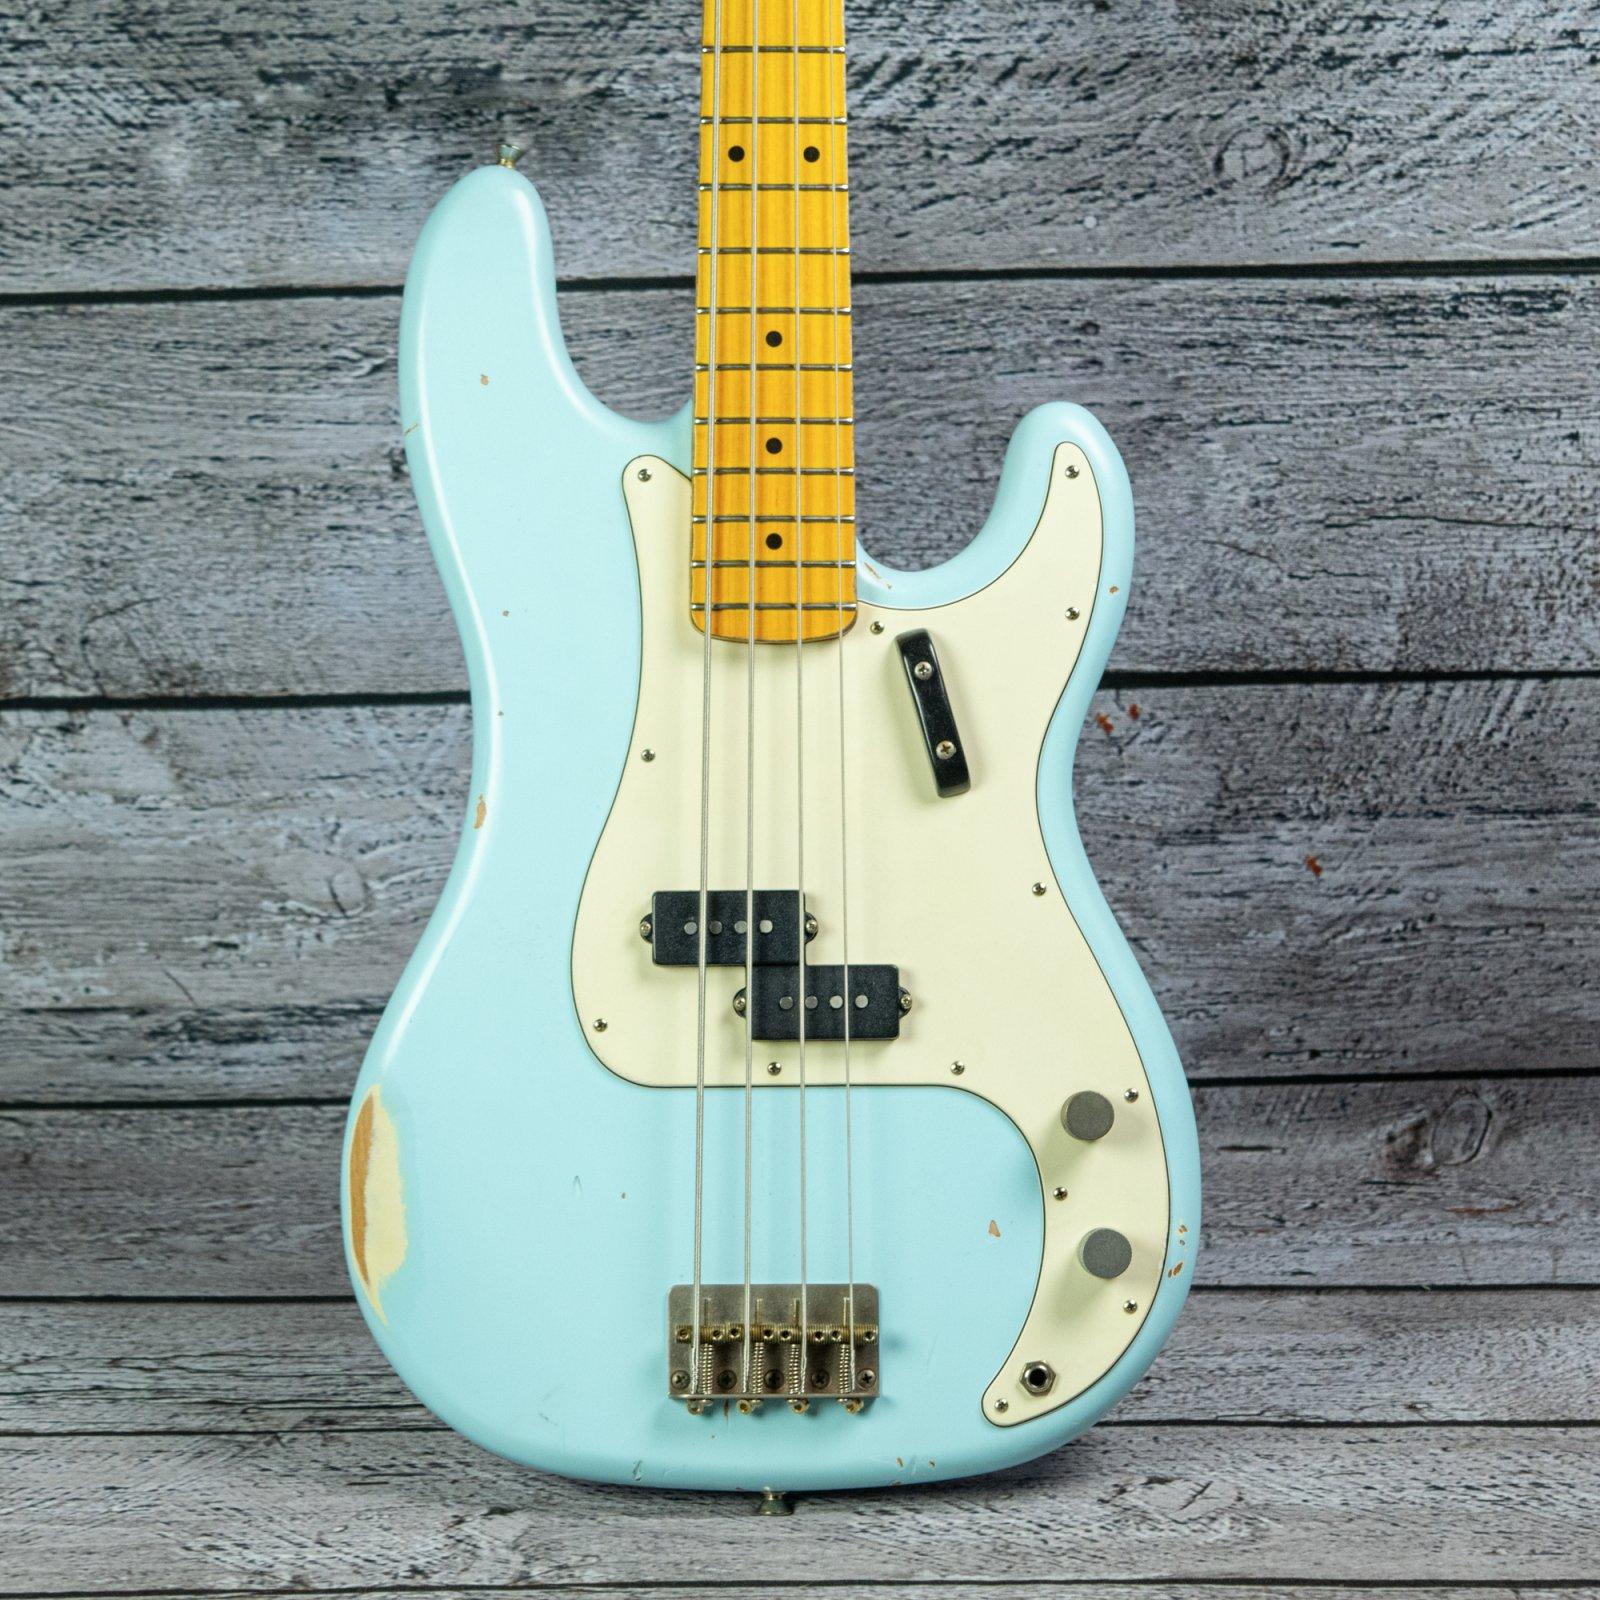 Nash Guitars PB-57MH Bass - Maple Fingerboard, Sonic Blue